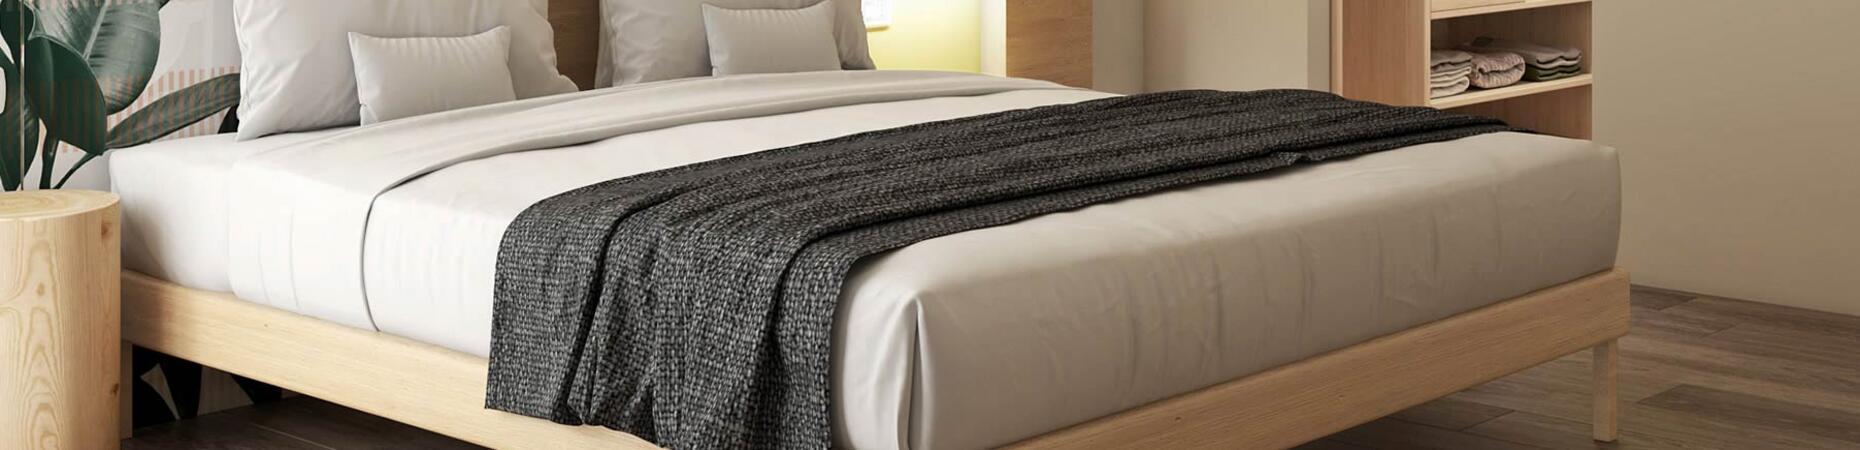 hotelhollywood it camere 013